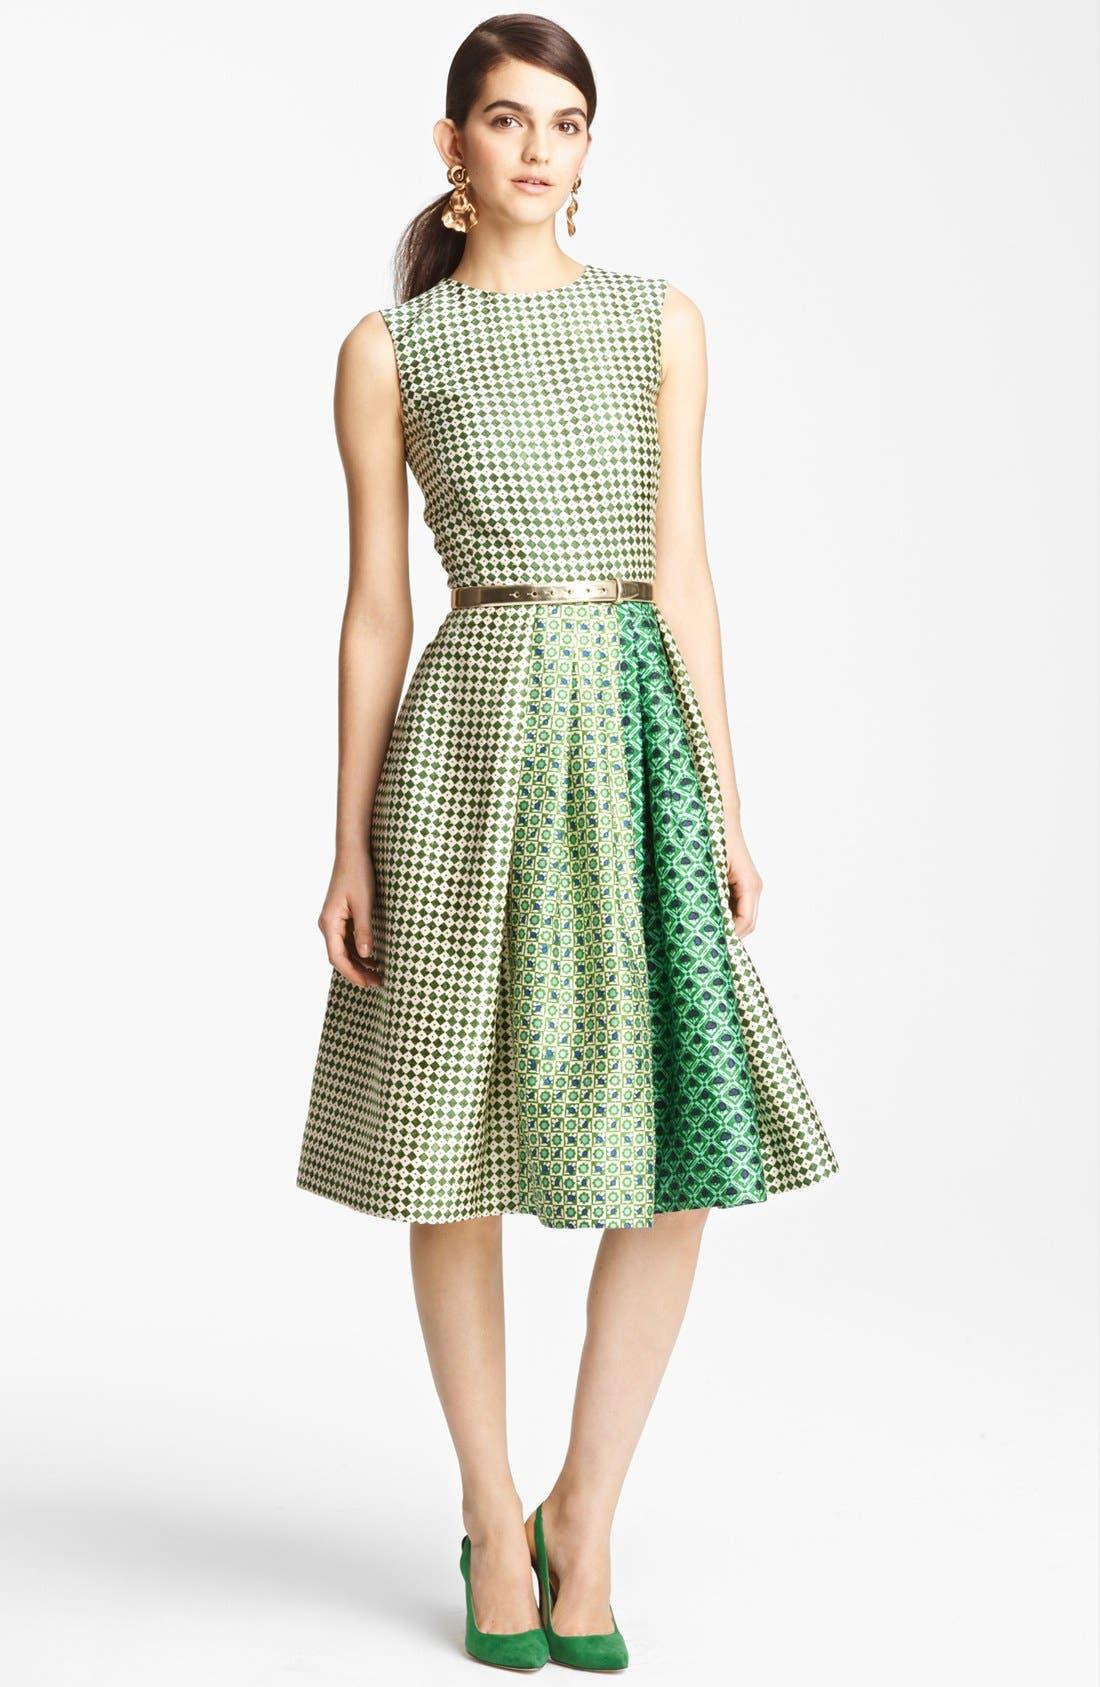 Alternate Image 1 Selected - Oscar de la Renta Print Full Skirt Dress